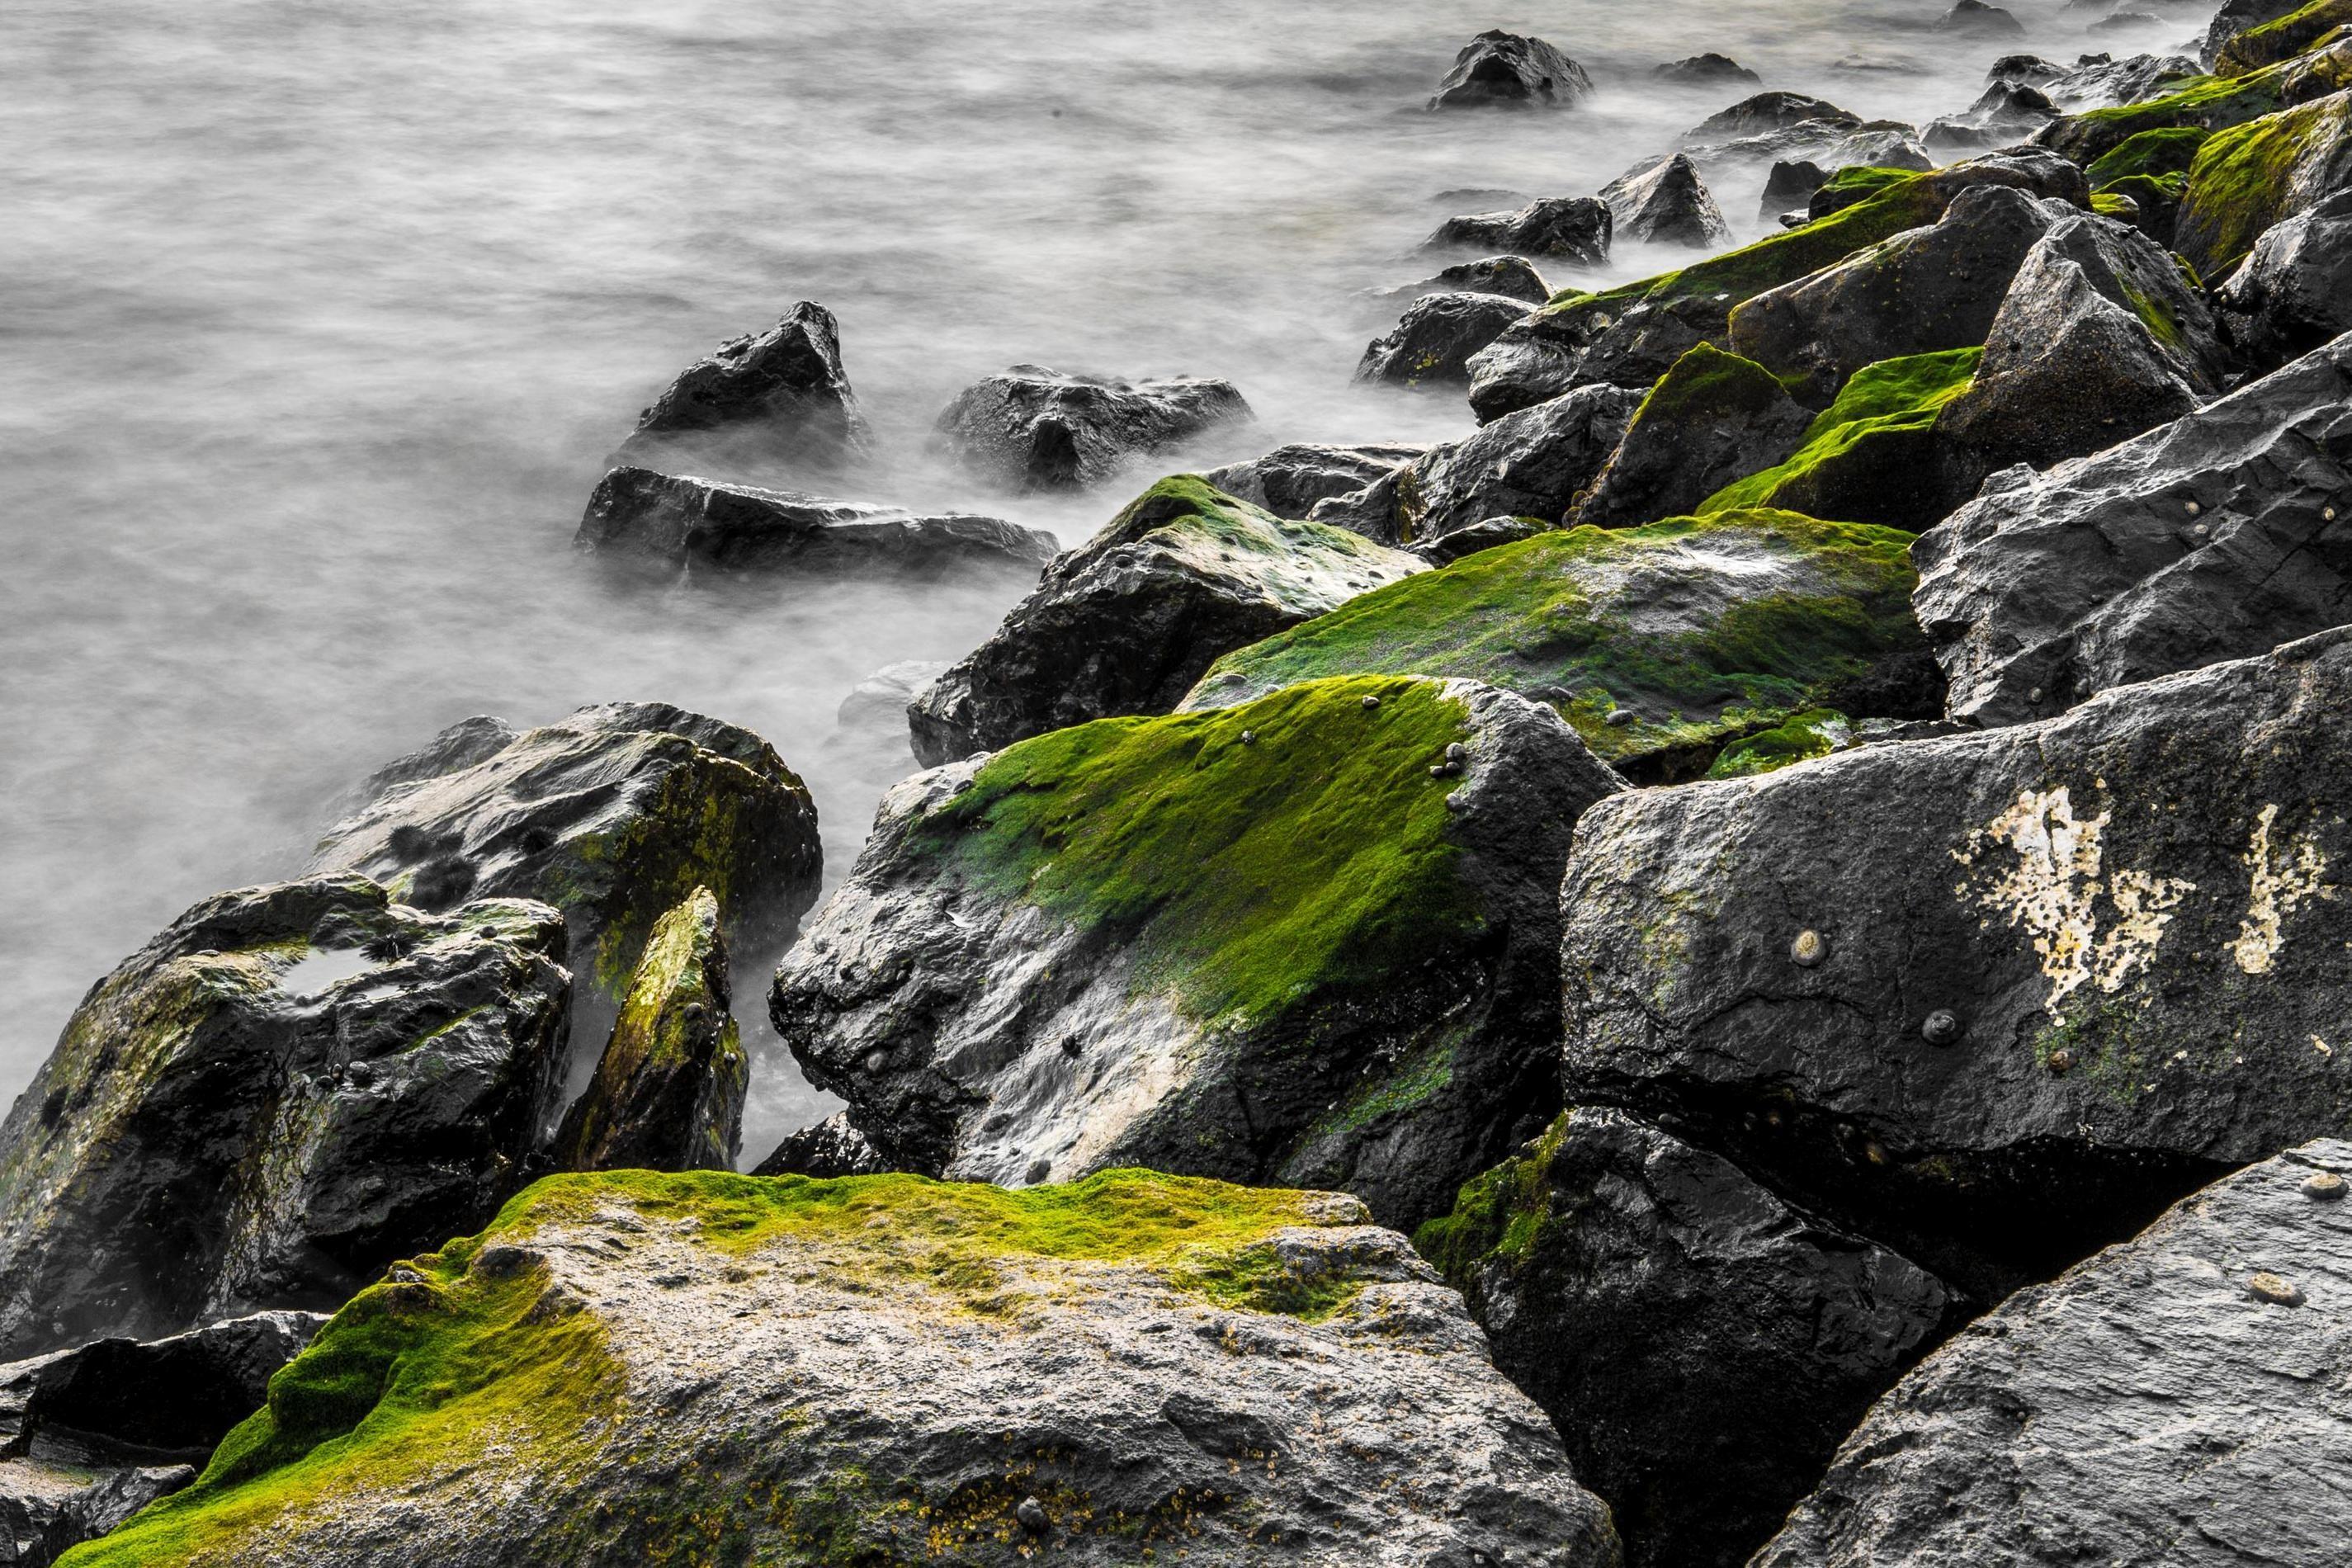 Free Picture Nature Coastline Ocean Nature Landscape Rocks Coast Fog Foggy Stones Green Sea